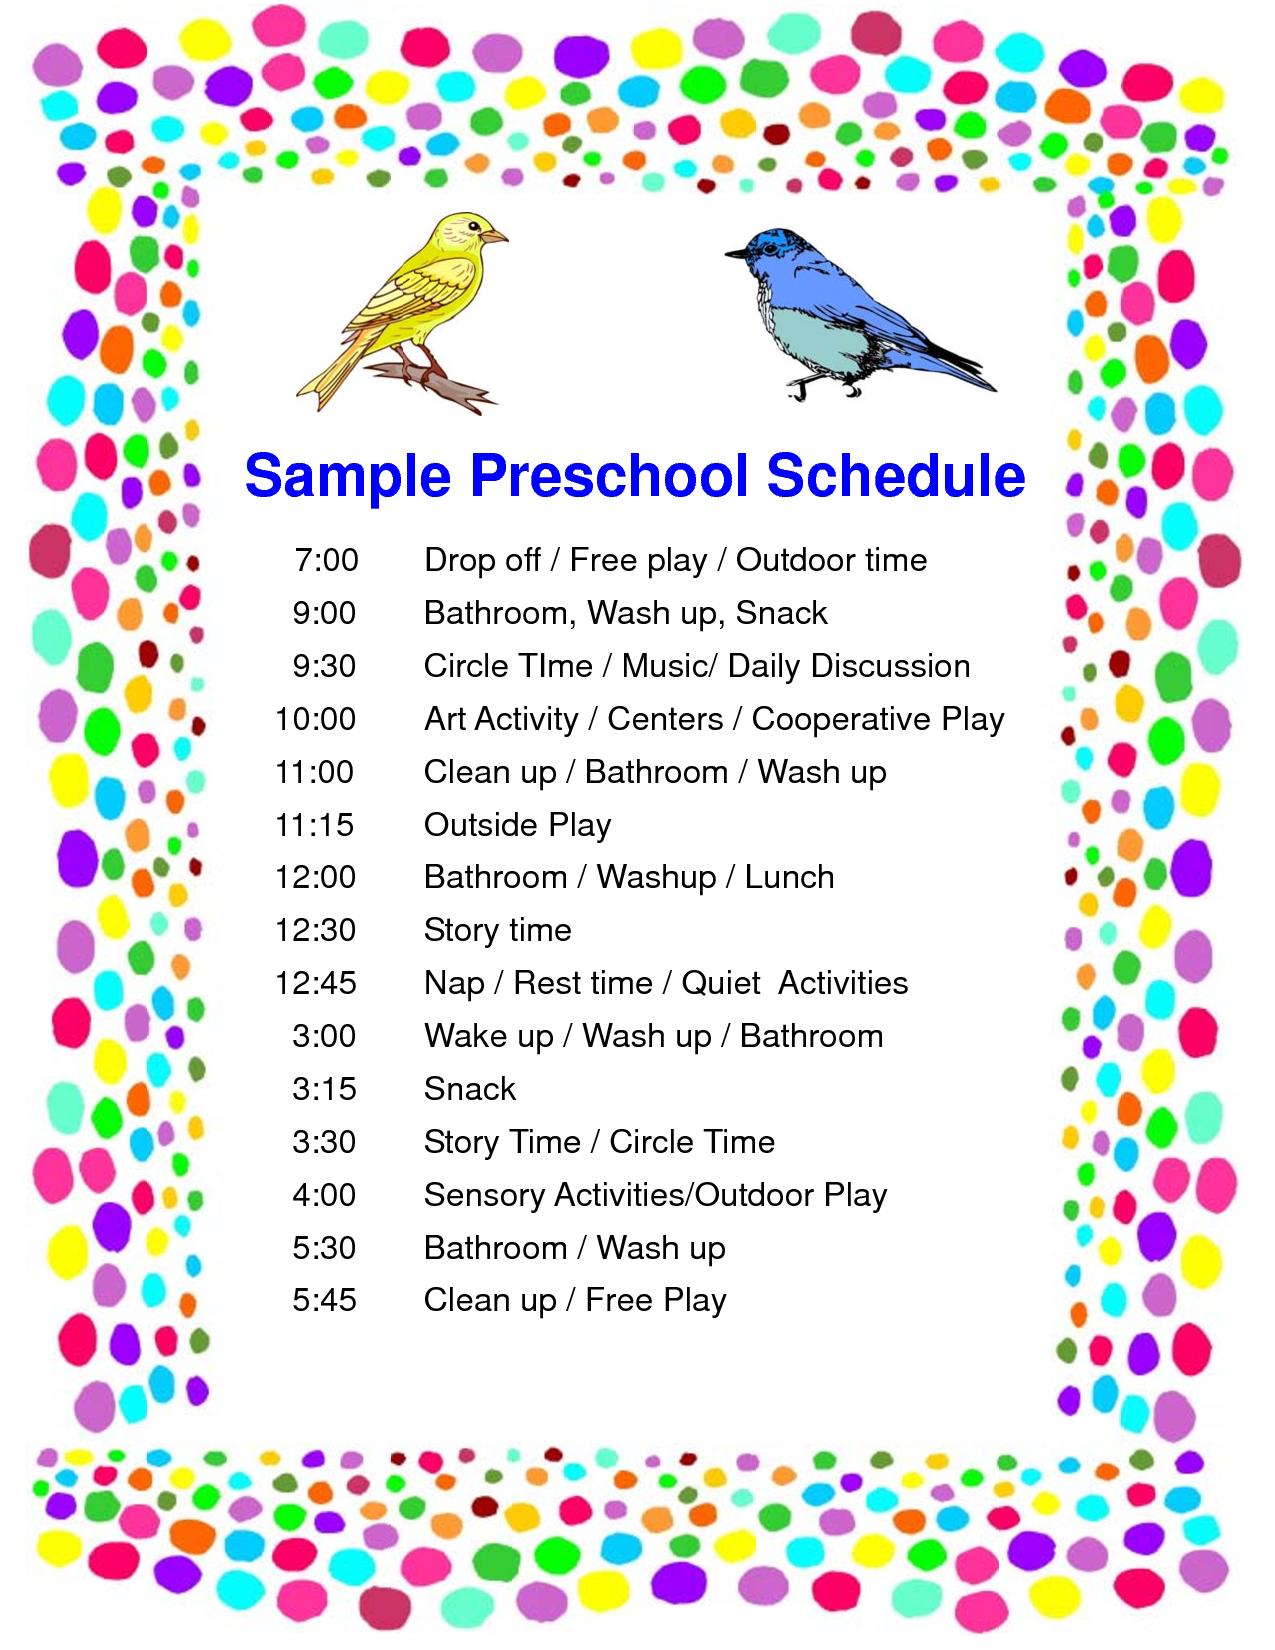 Time Daily Part Schedule Preschool